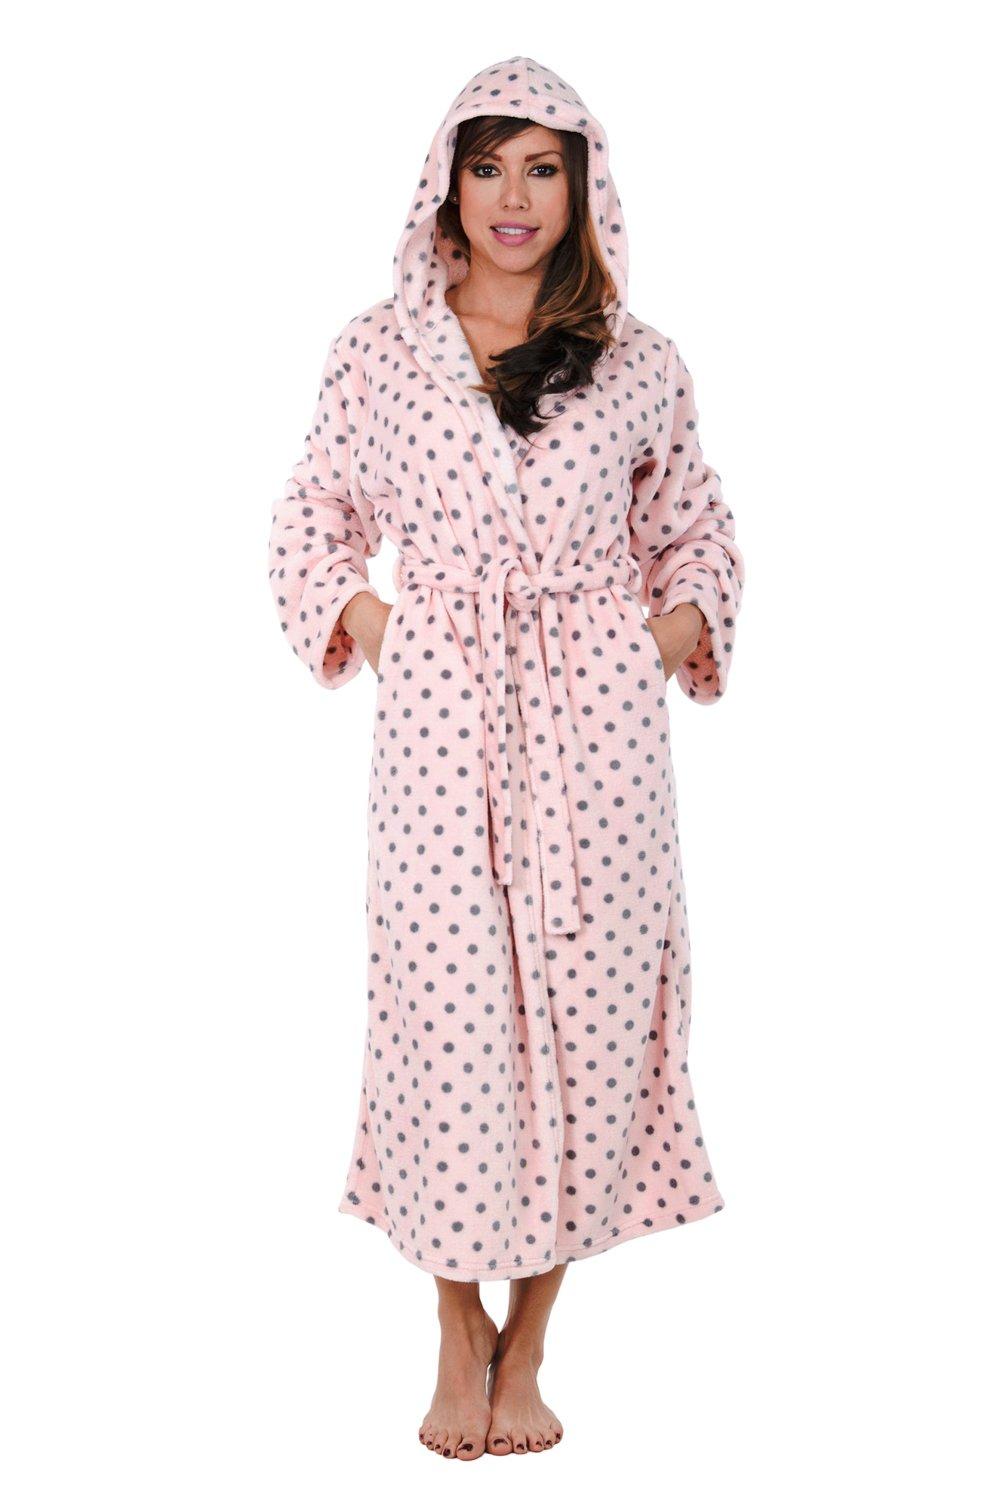 Hoodie Robe Hooded Robe Spa Bathrobe Hoody Robe Long Robe … (Large, Pink Polka Dot) by Love This Robe (Image #3)